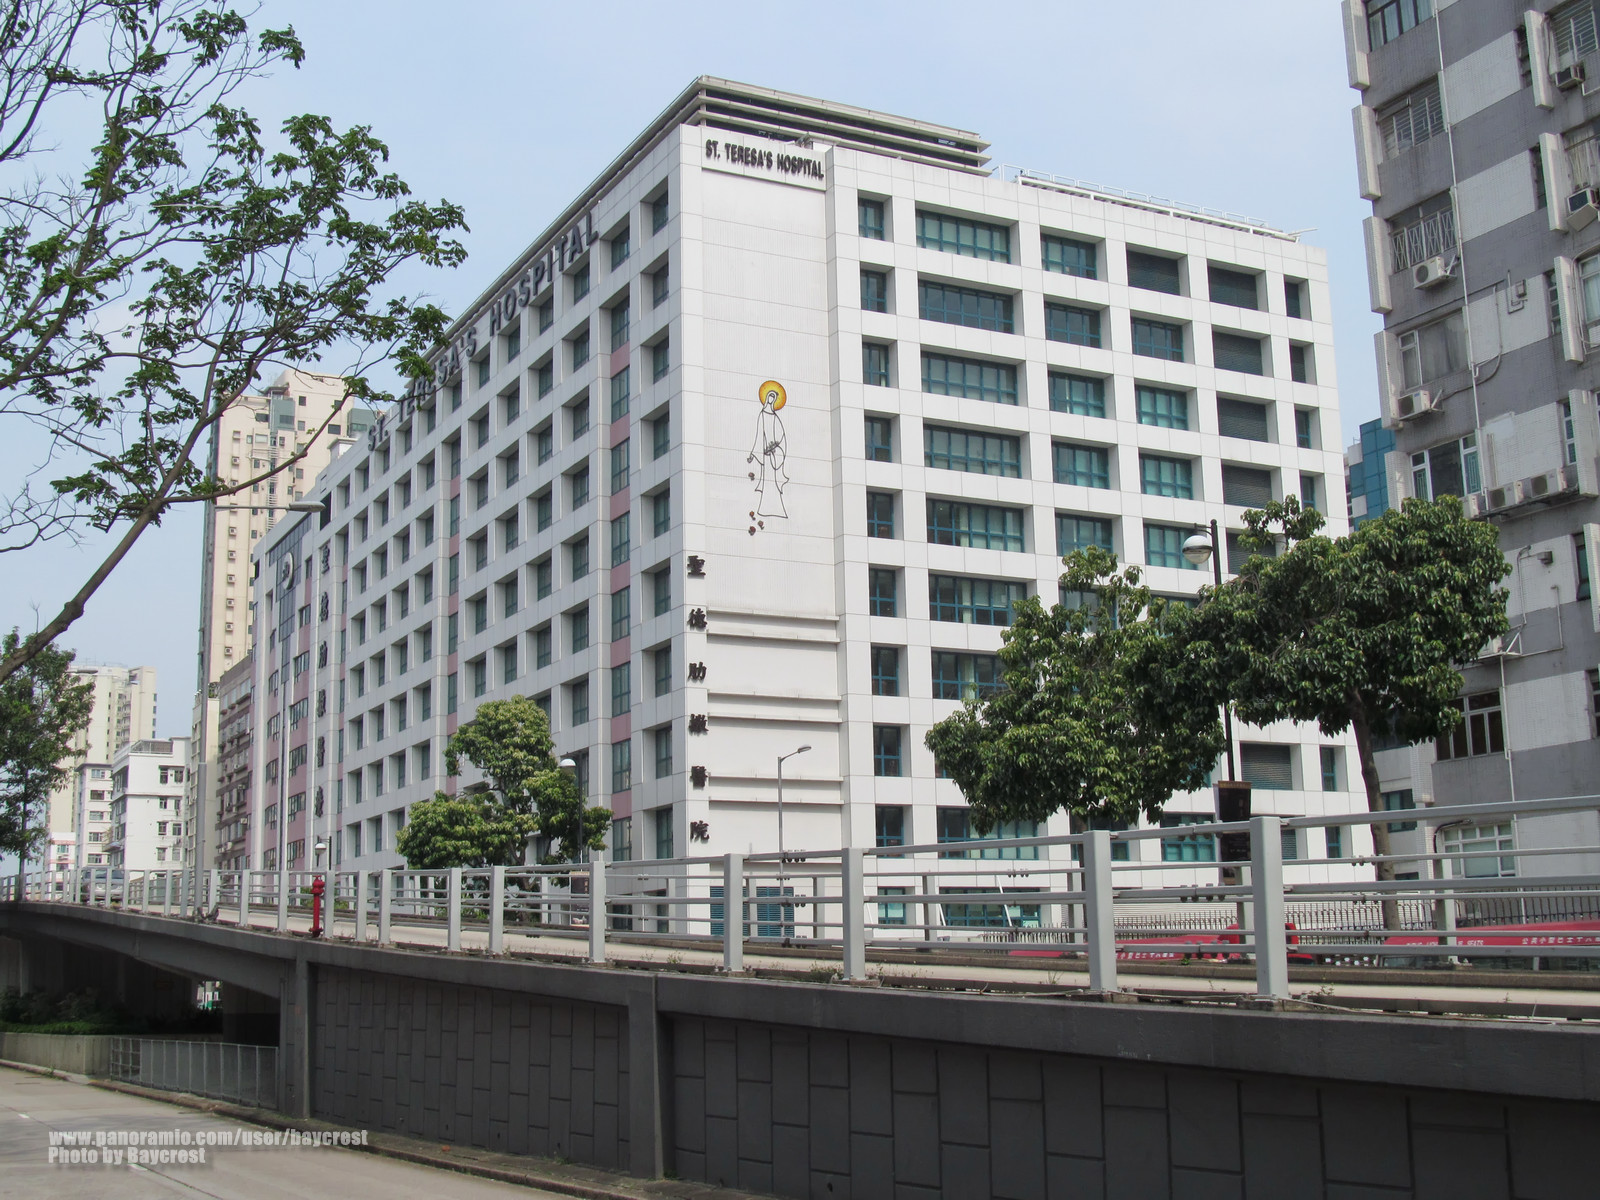 Saint Teresa's Hospital